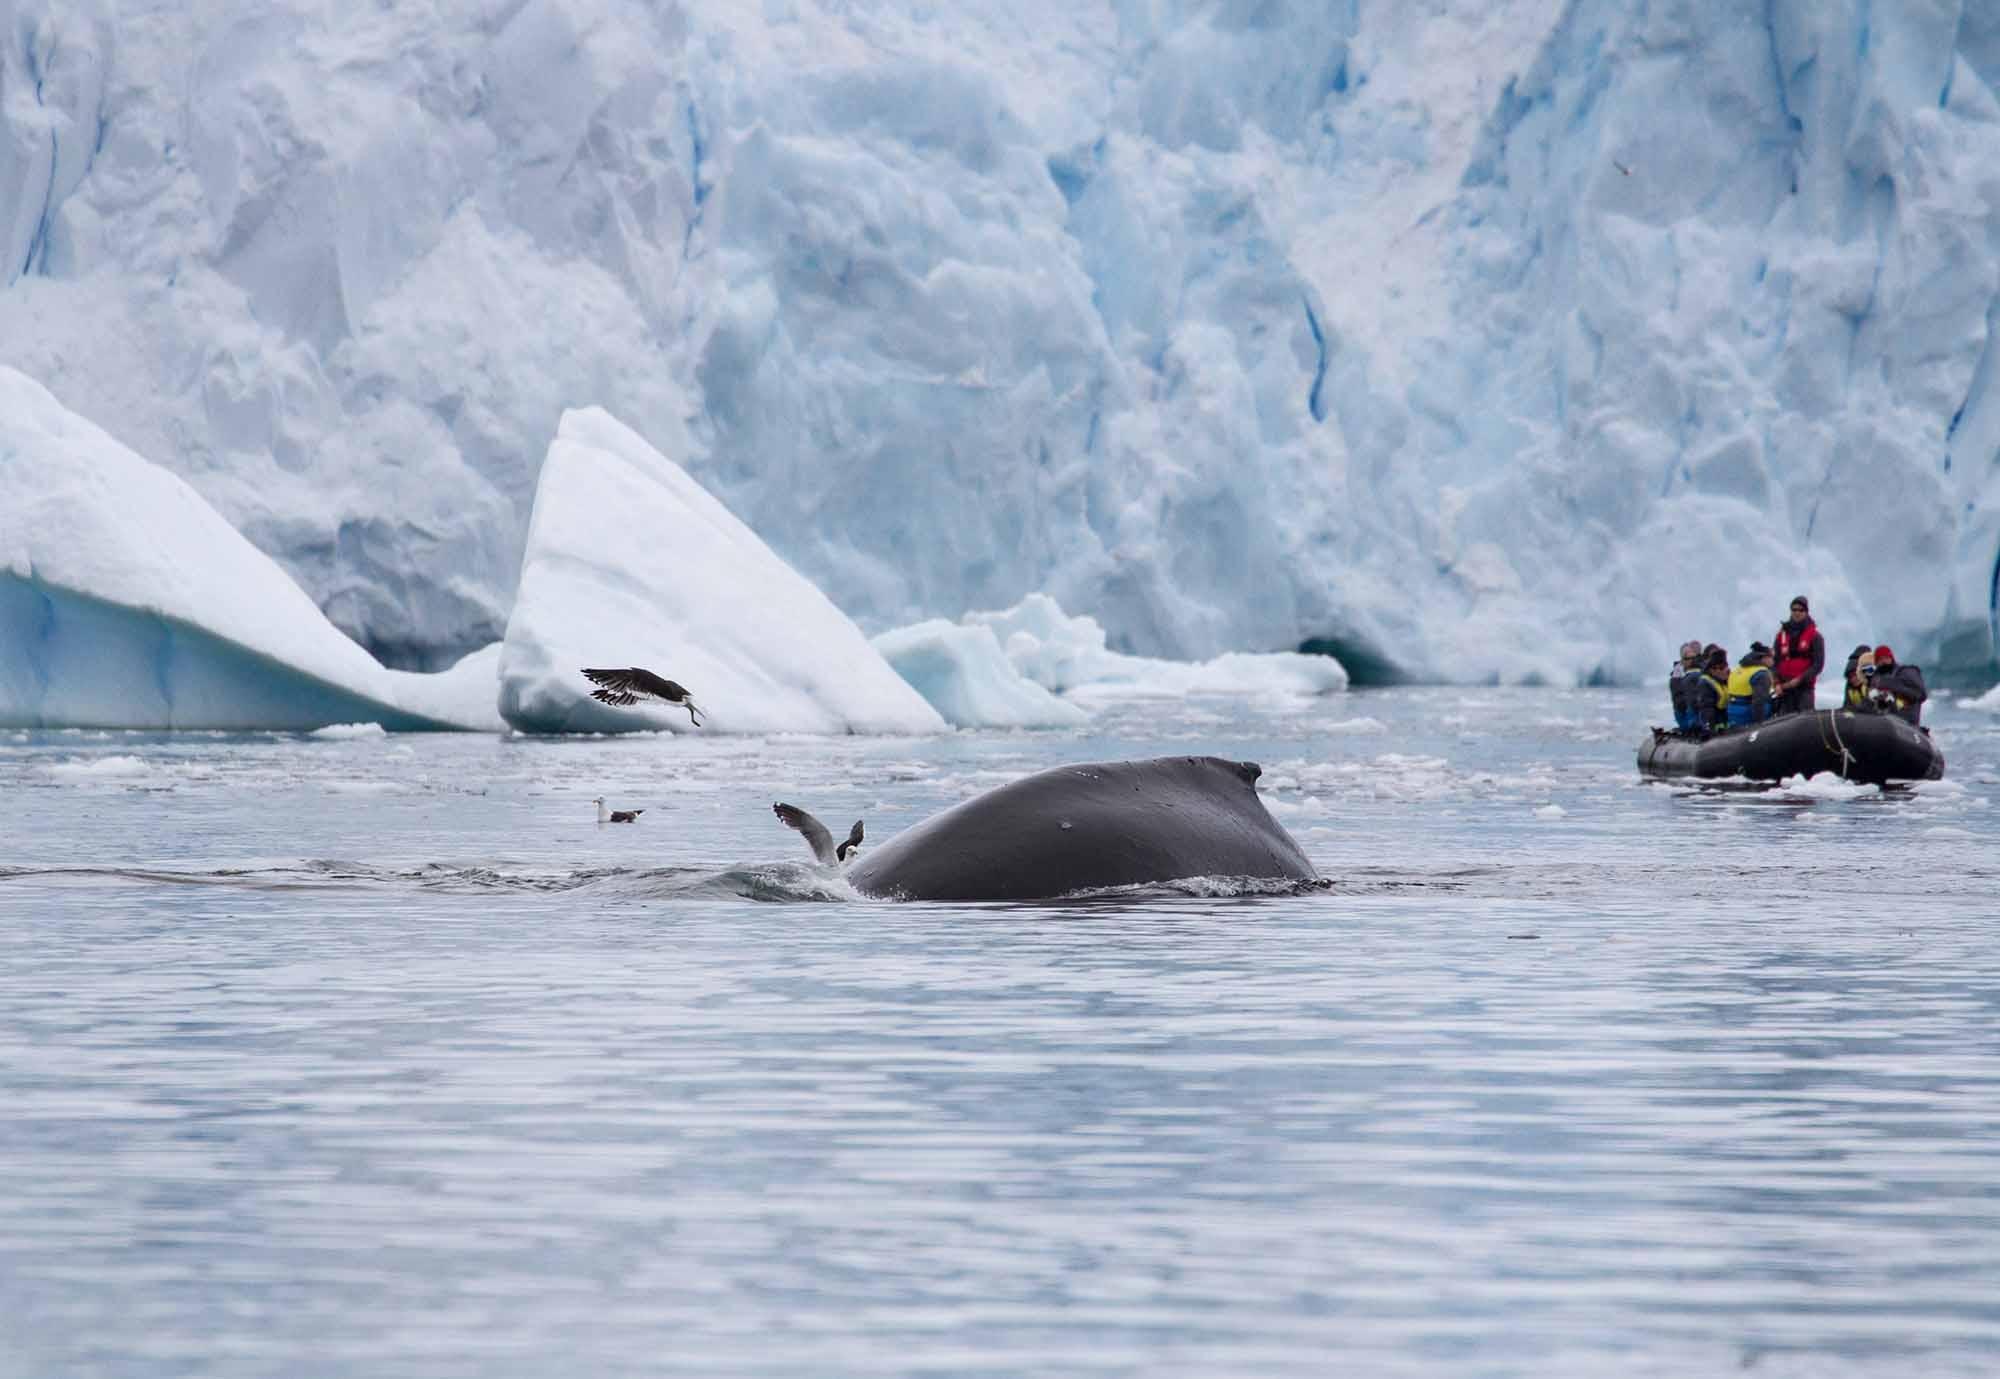 Zodiacand Whale | Antarctica